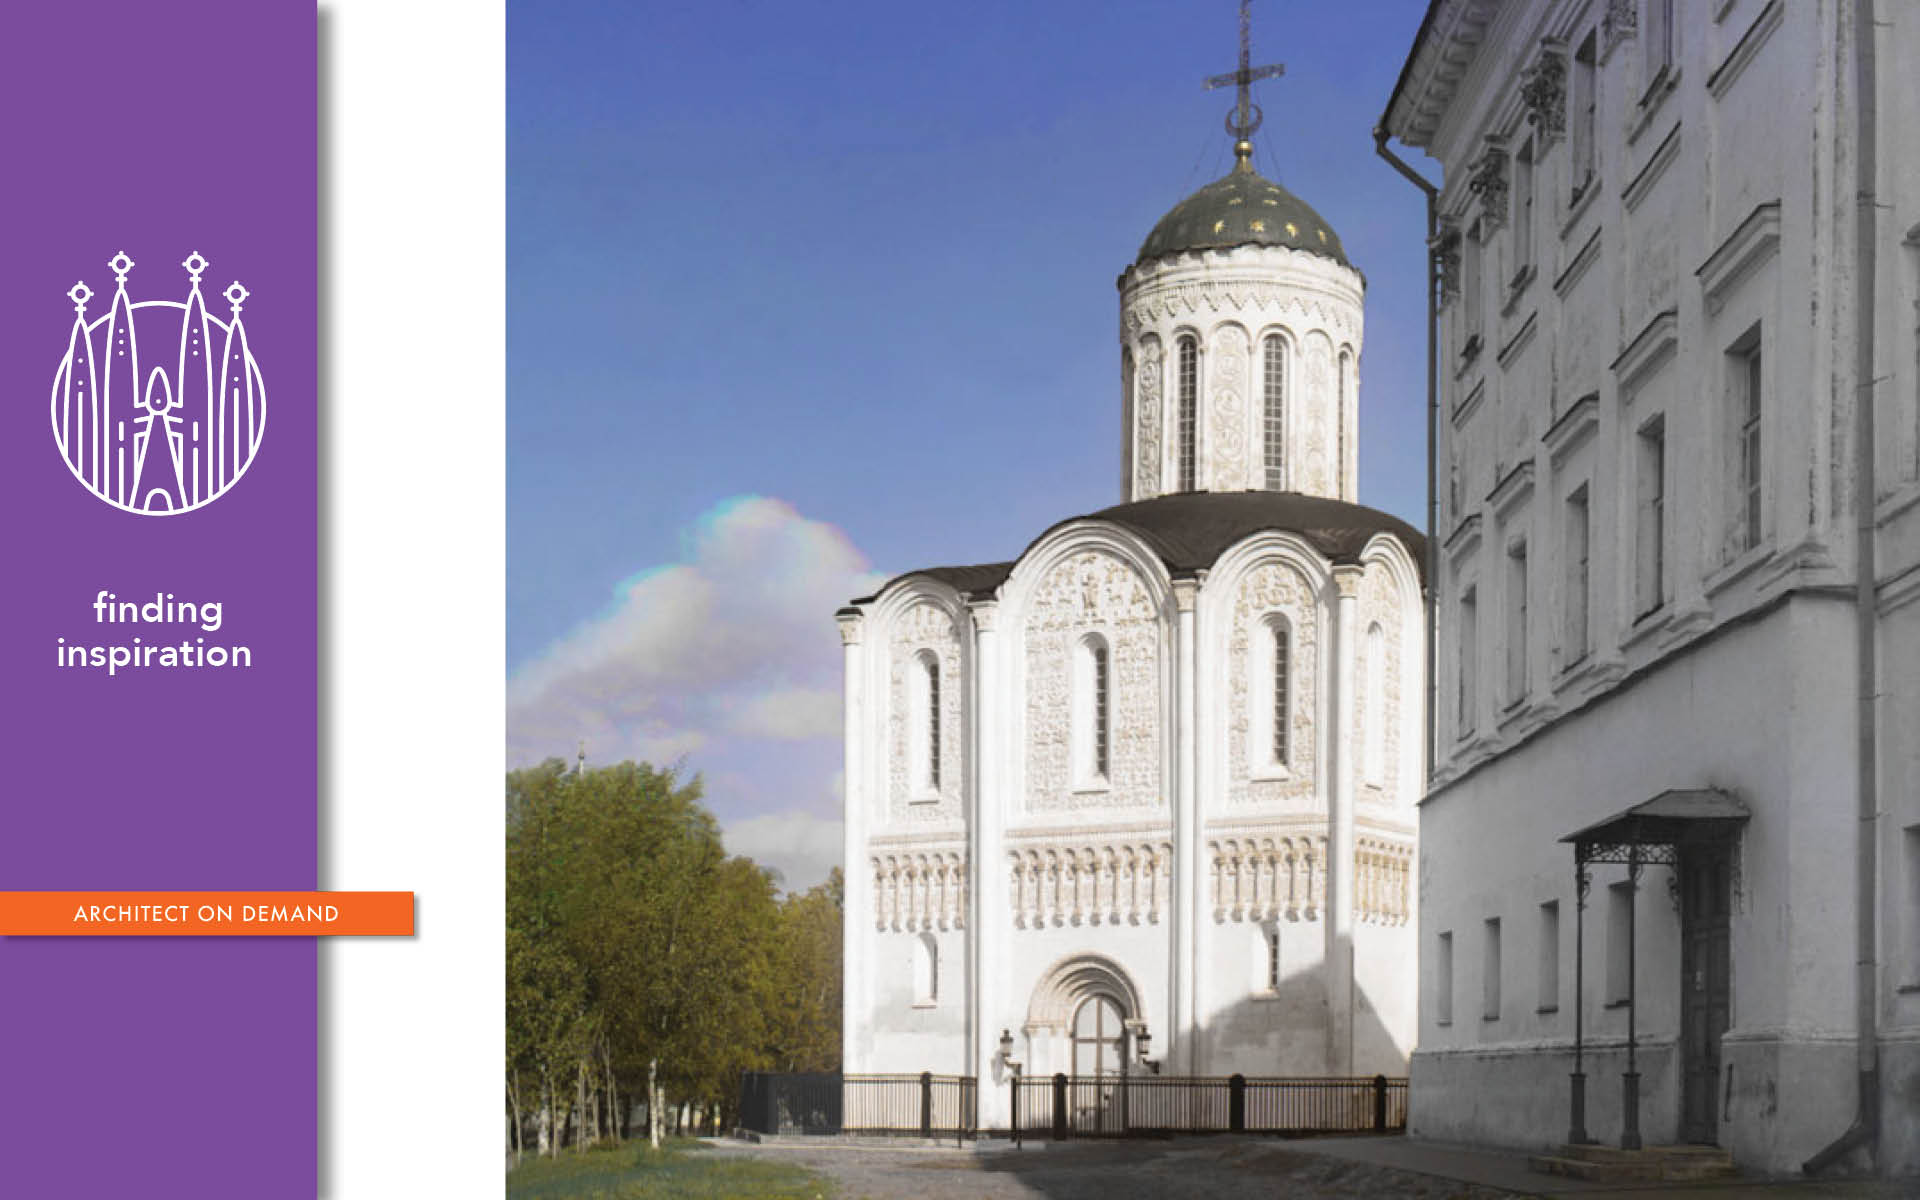 Prokudin-Gorskii, architect-on-demand, advice-without-strings